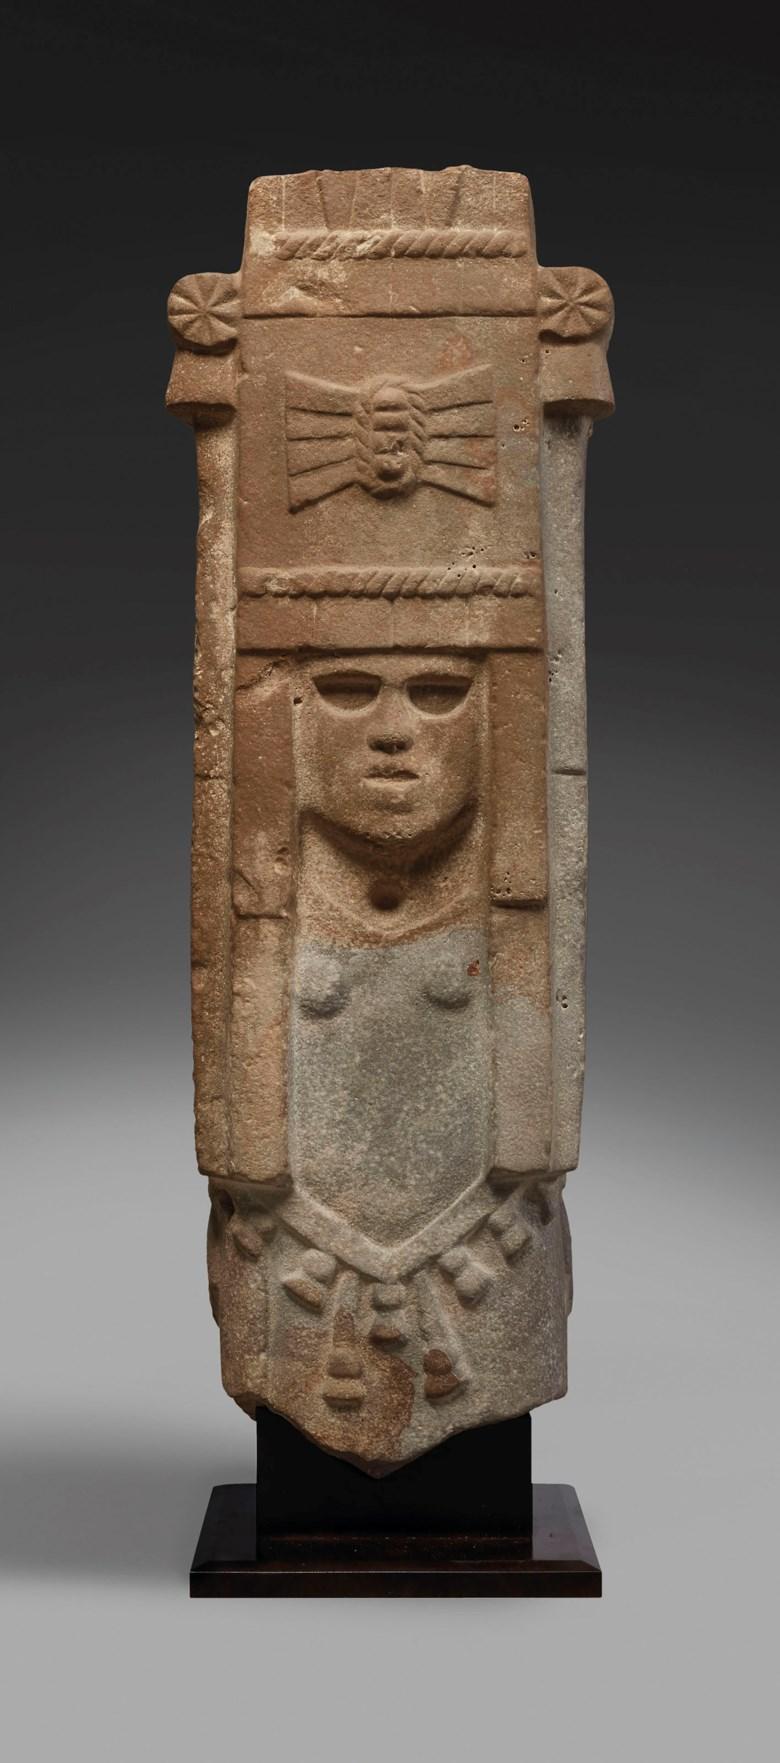 Huastèque - Aztèque stone figure of Chicomecoatl, Env. 1300-1521 AP. J.C.Height 101.5  cm (40  in). Sold for €118,750 on 9 April 2019 at Christie's in Paris